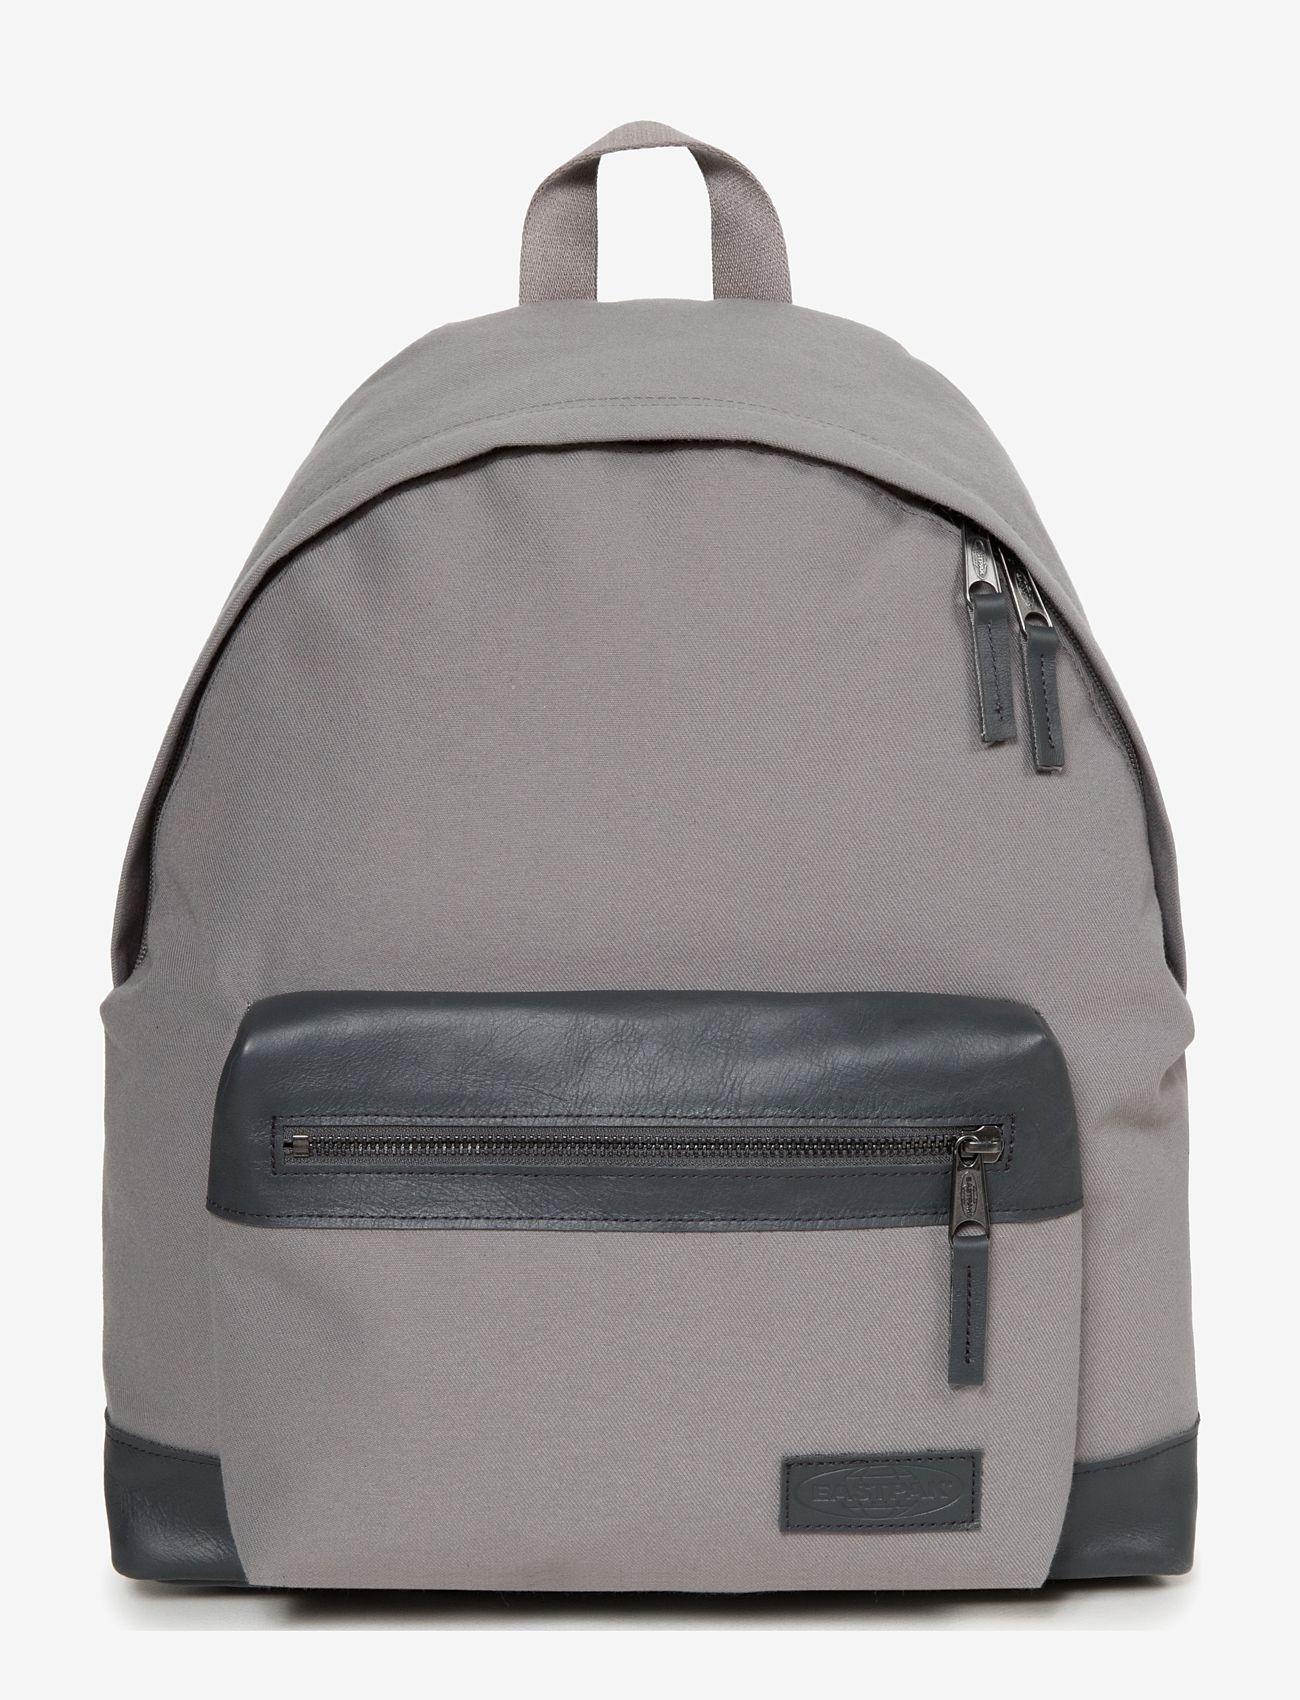 Eastpak - WYOMING - ryggsäckar - mix grey - 0